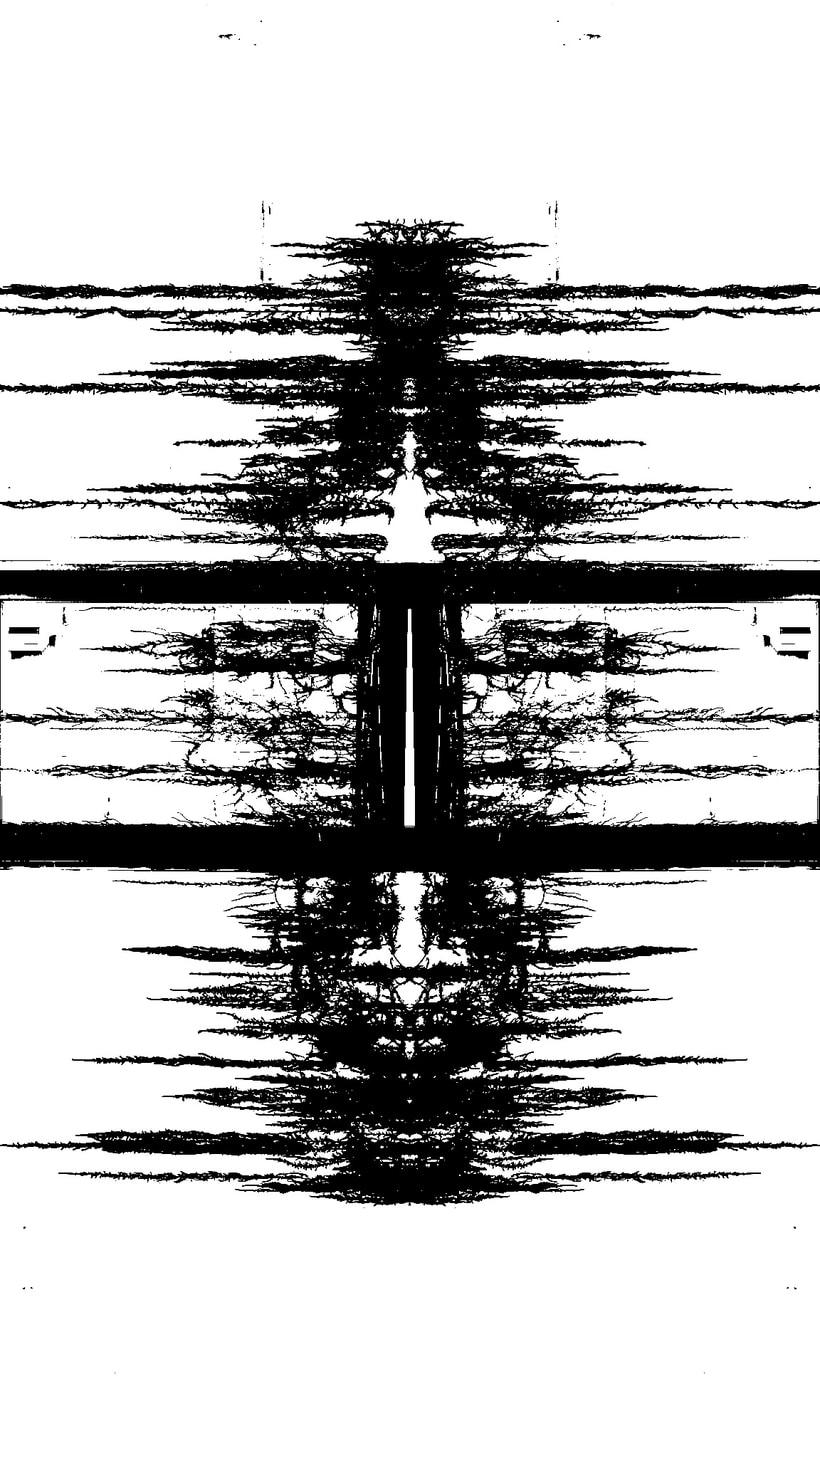 Imágenes ROSCHACH, múltiples lecturas. 16